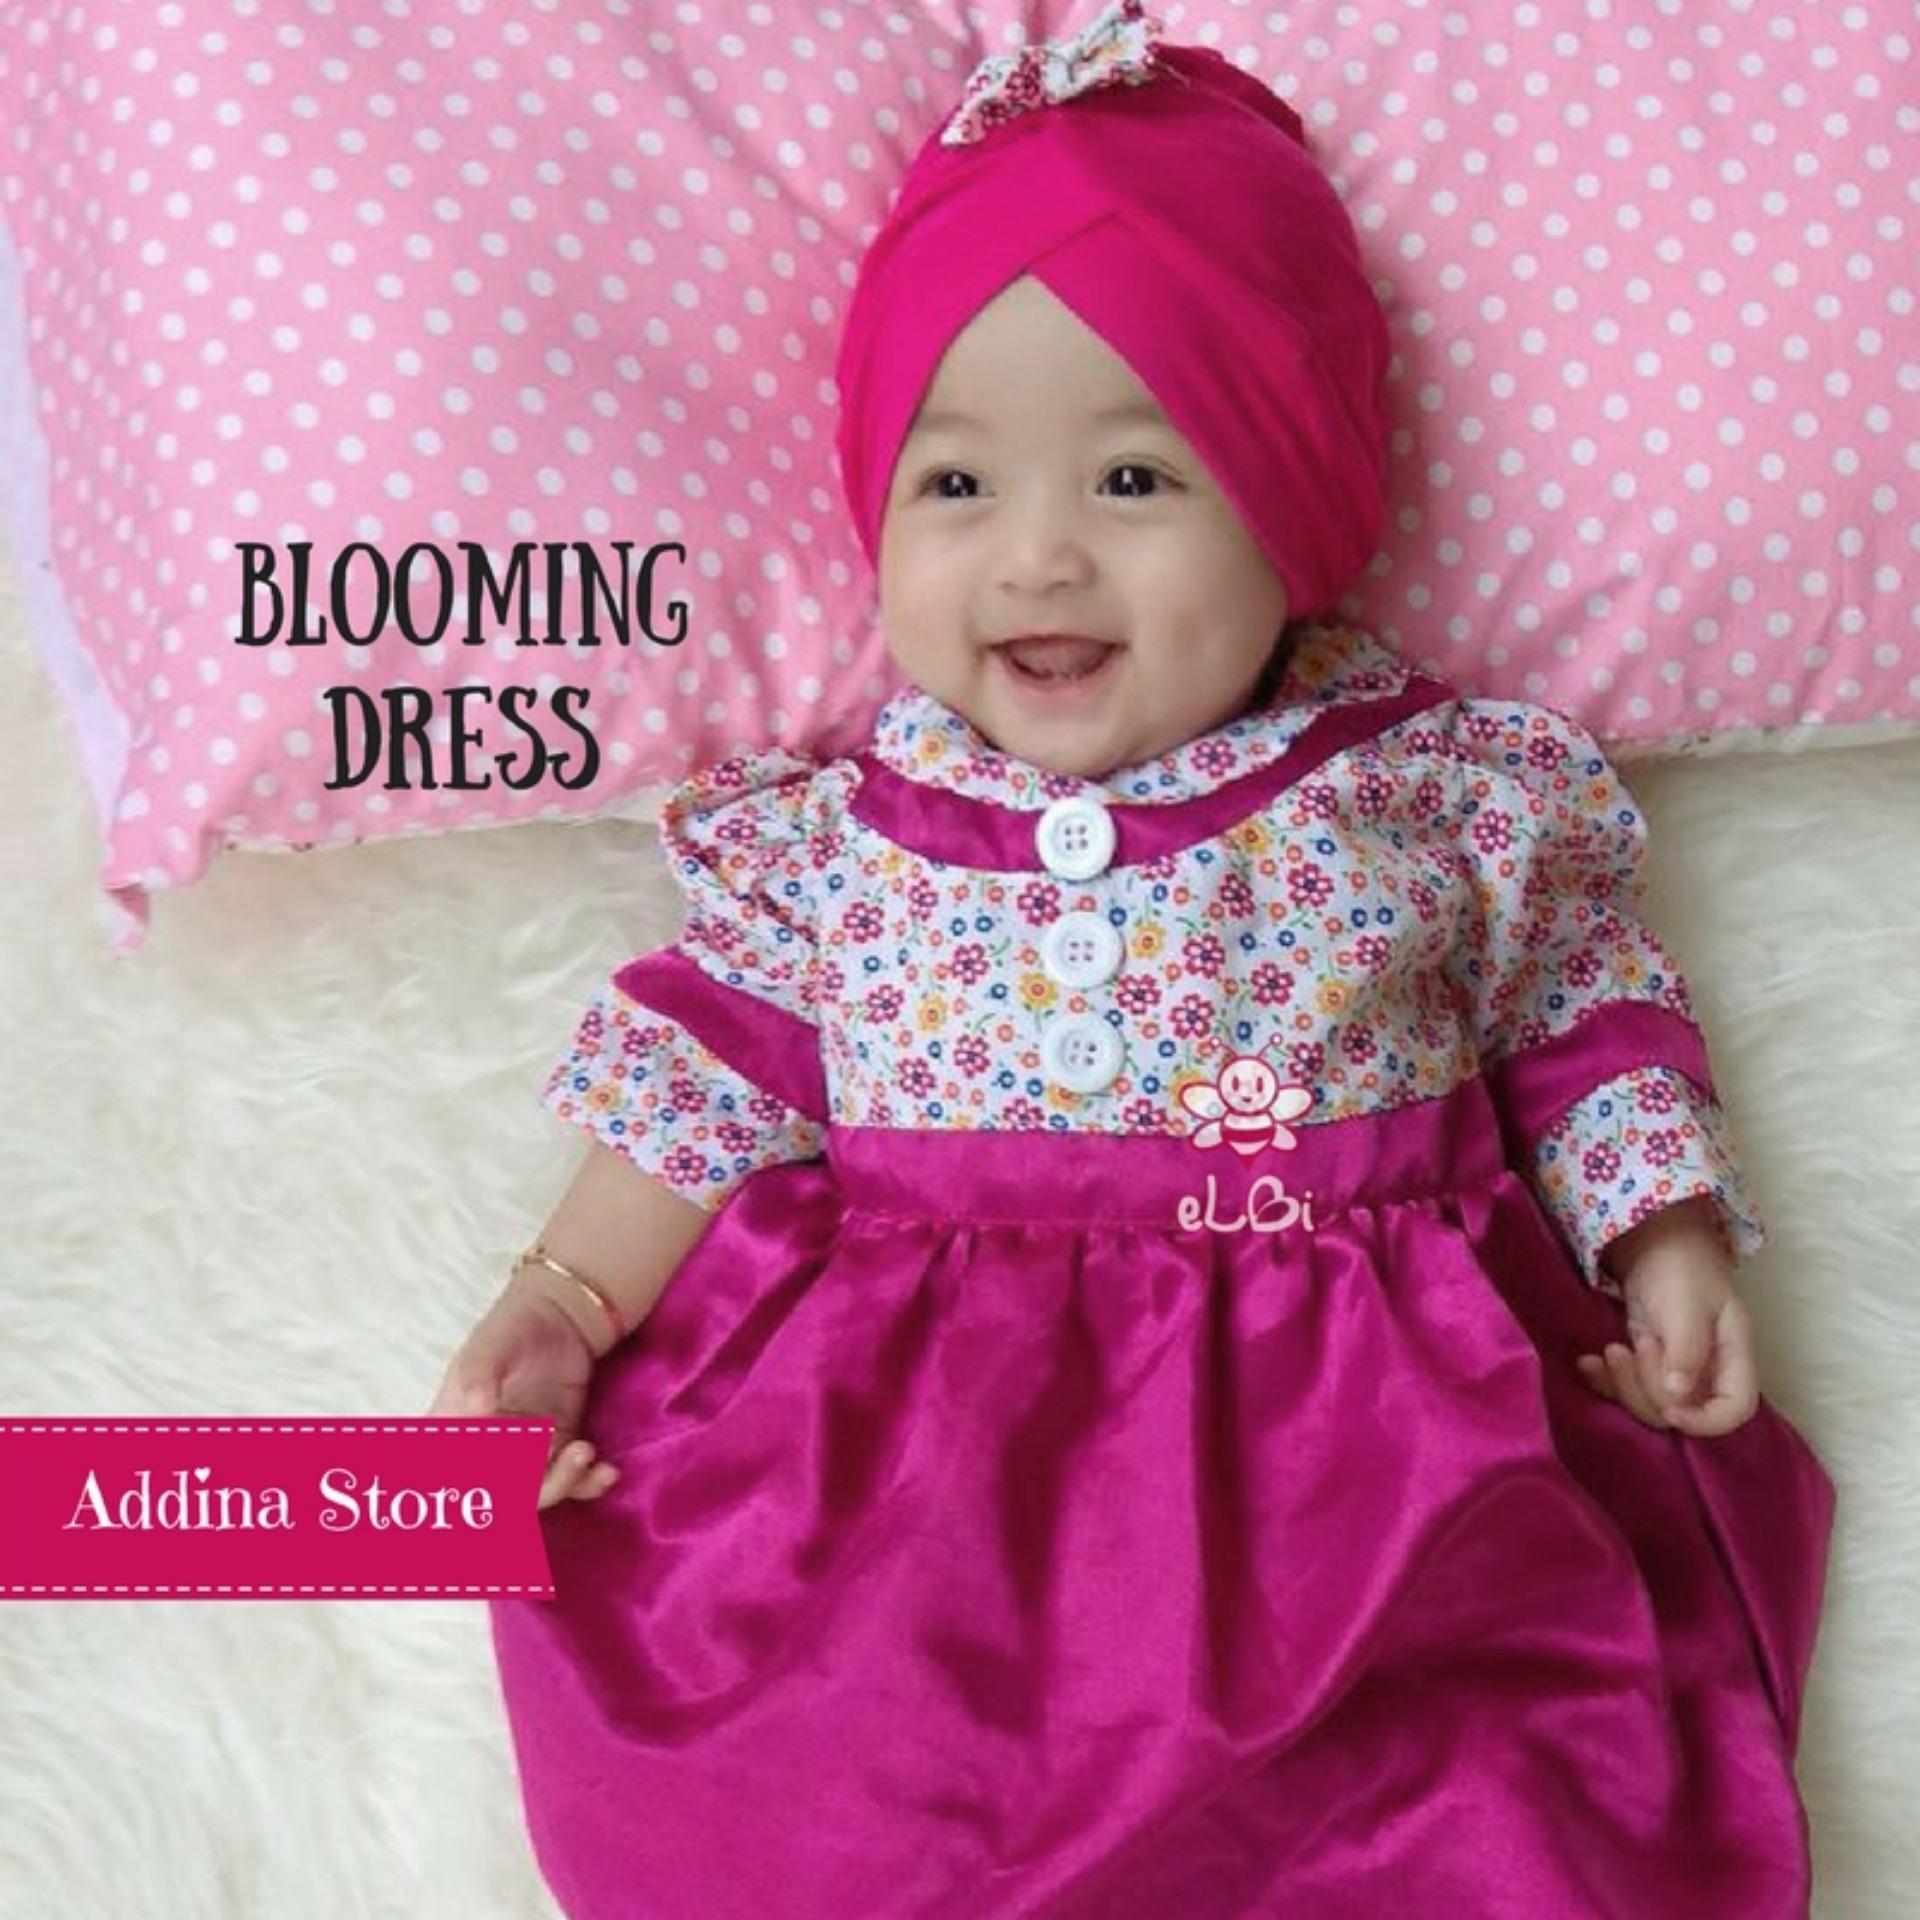 Top 10 Elbi Blooming Dress Dengan Turban Baju Bayi Baju Bayi Perempuan Baju Bayi Cewek Baju Bayi Muslim Baju Bayi Lucu Addina Store Online